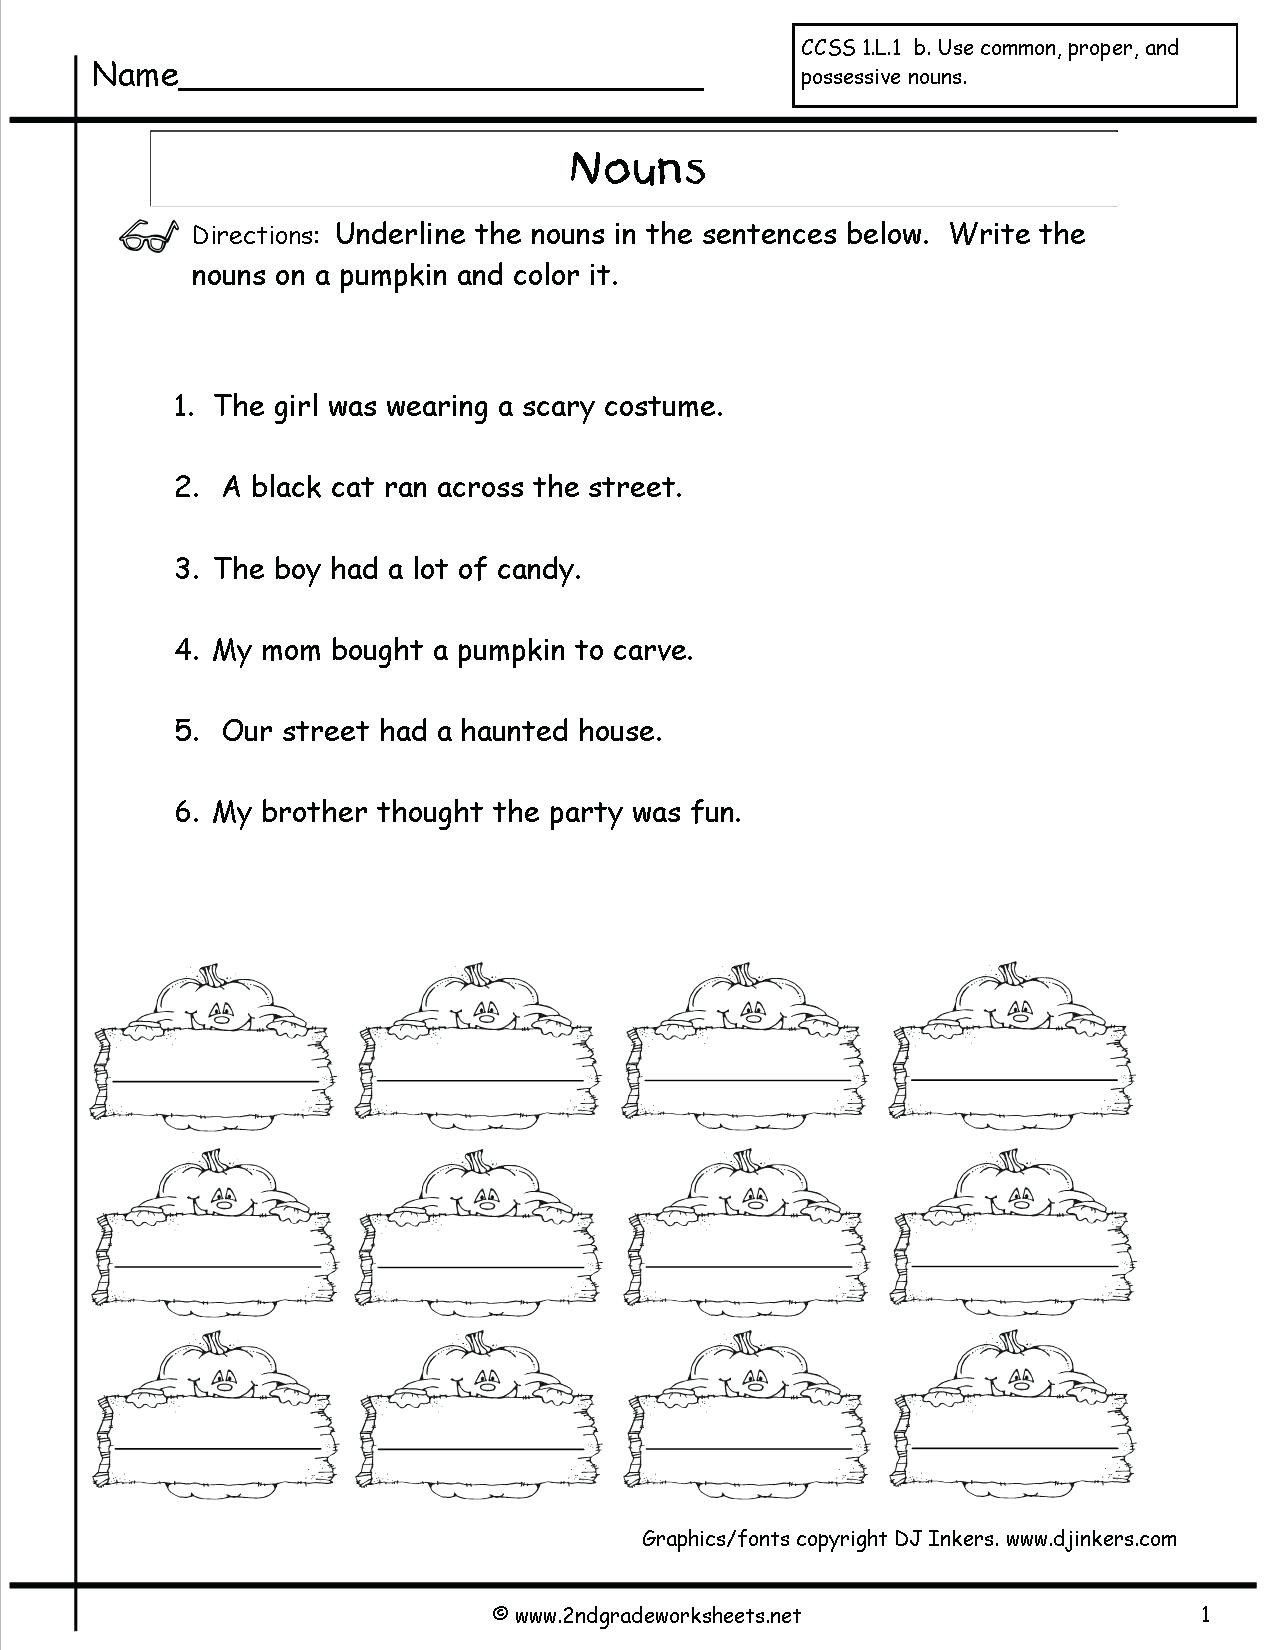 Grammar Worksheets Middle School Noun Worksheet Nouns Worksheet Grammar  Worksheets Middle   Nouns worksheet [ 1650 x 1275 Pixel ]